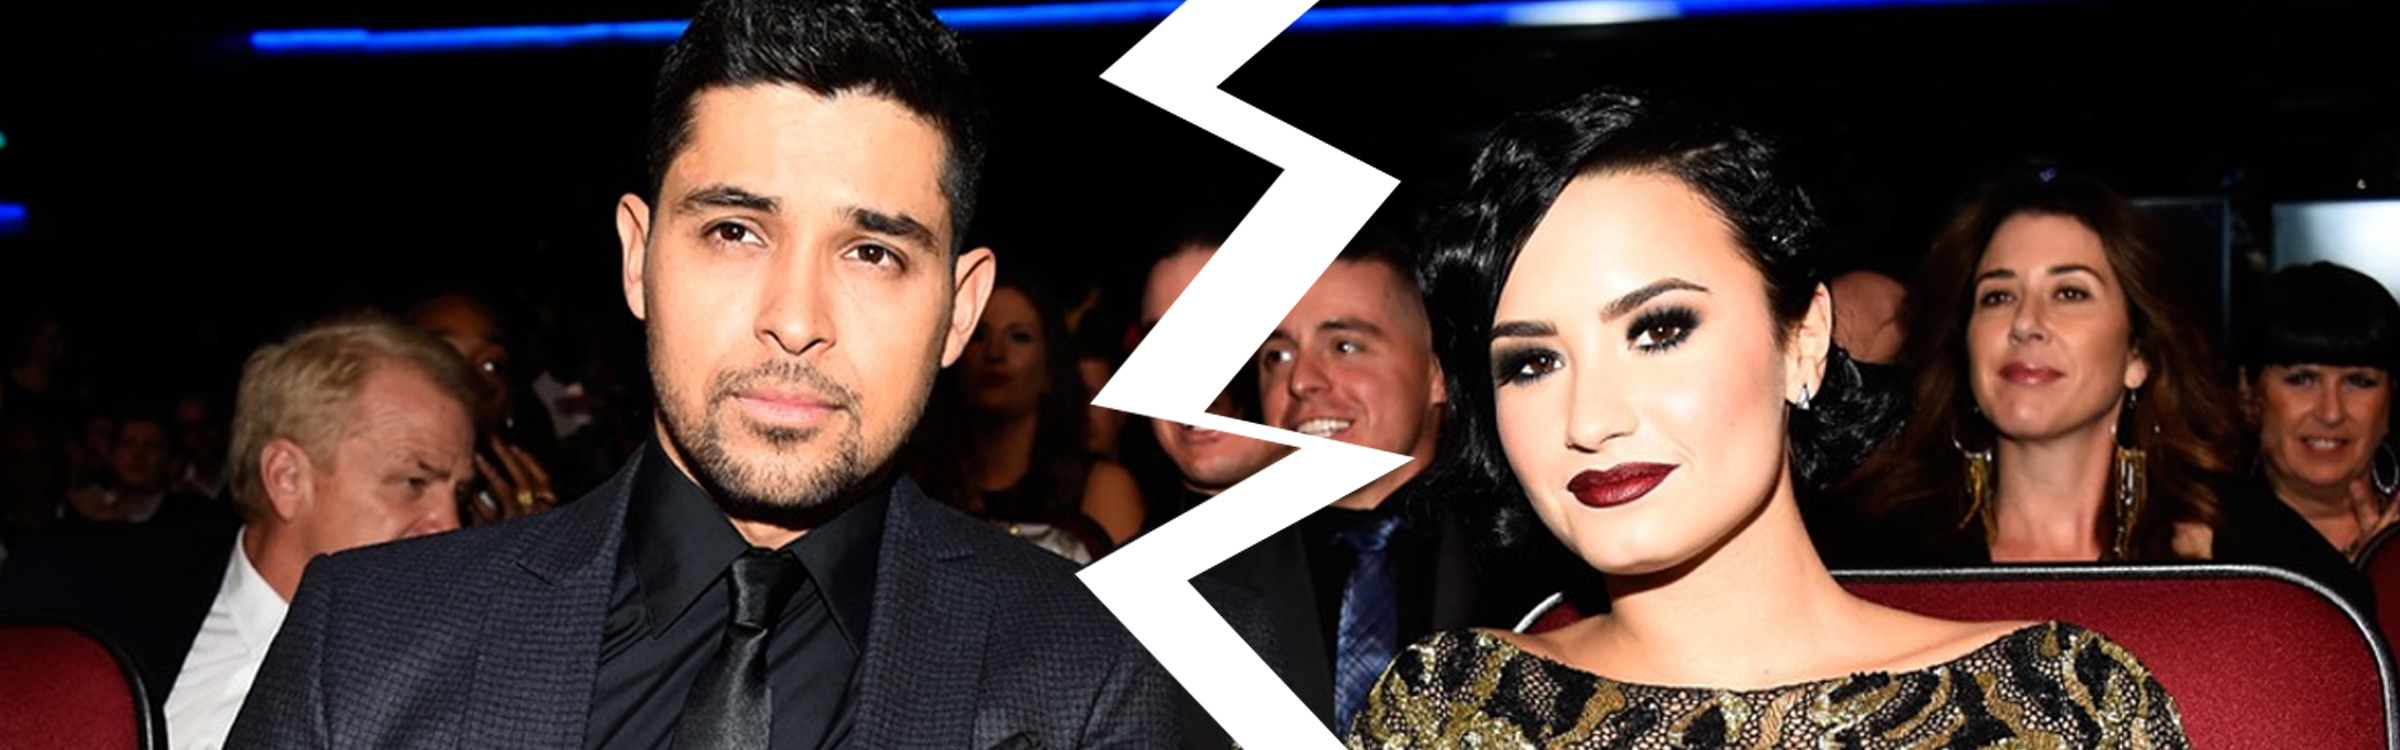 Demi wilmer break up header